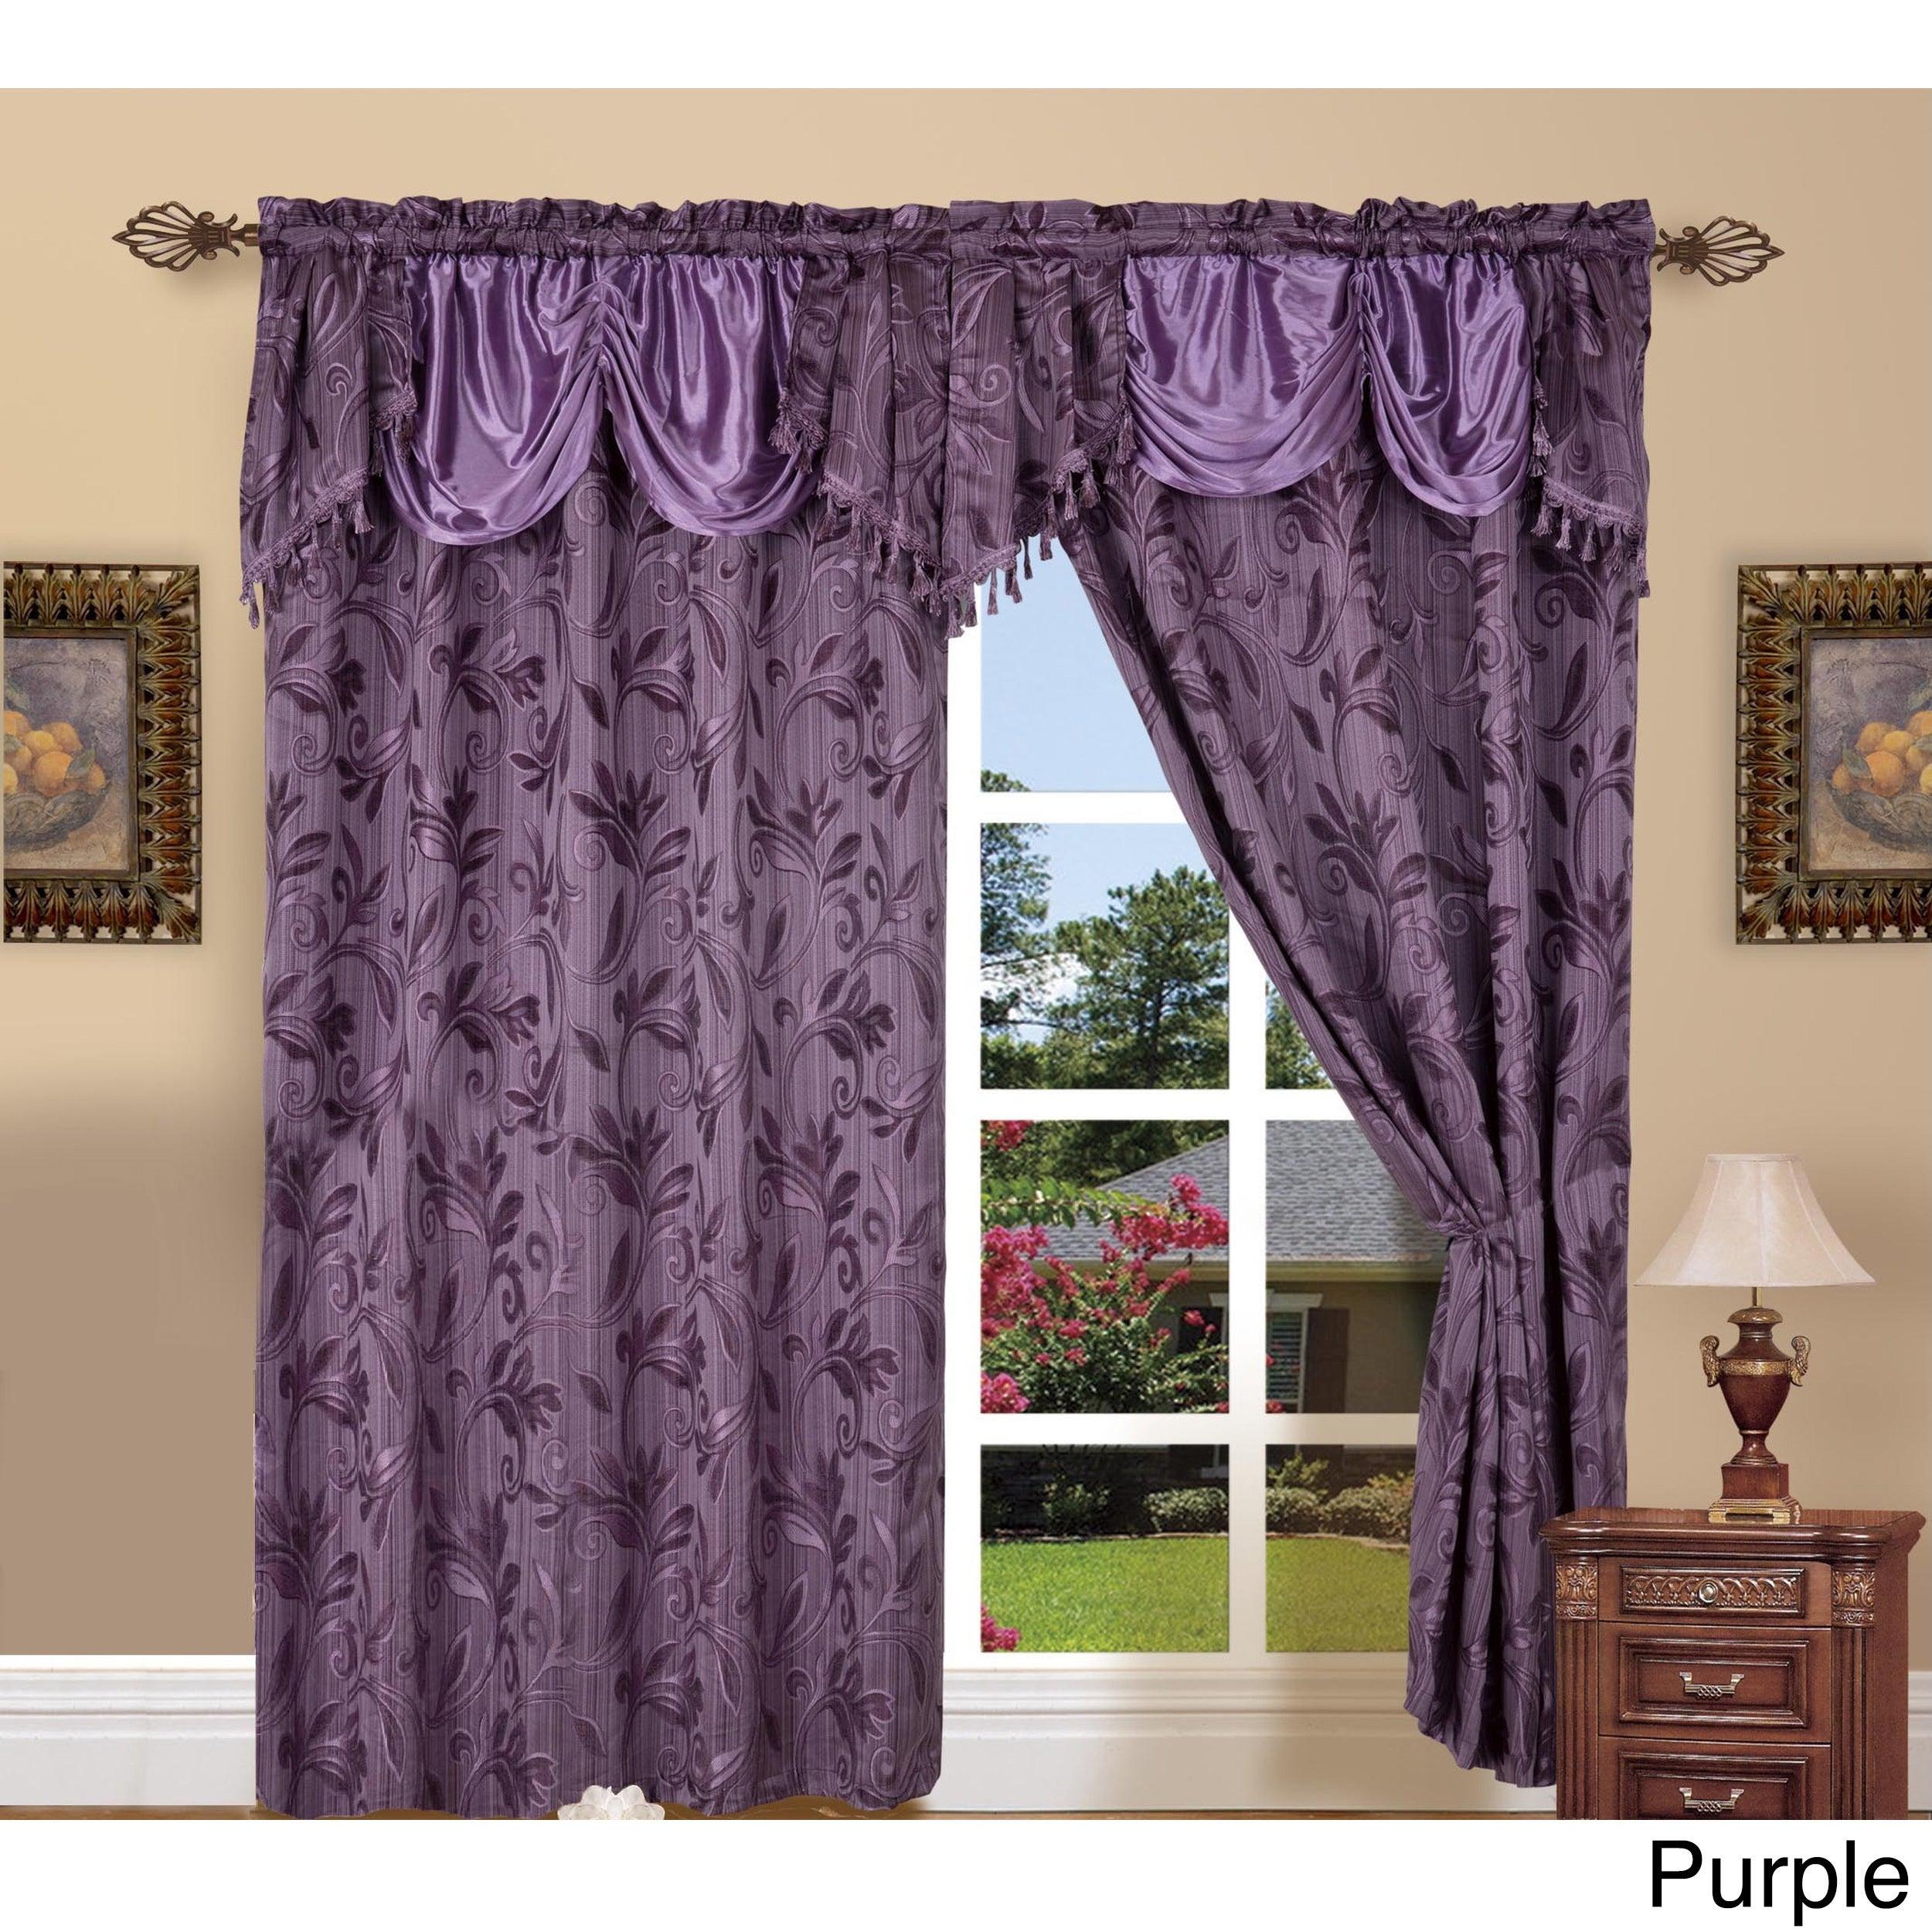 Elegant Comfort Luxury Jacquard Rod Pocket 54 Inch Window Curtain Panel Pair In Elegant Comfort Window Sheer Curtain Panel Pairs (View 5 of 20)